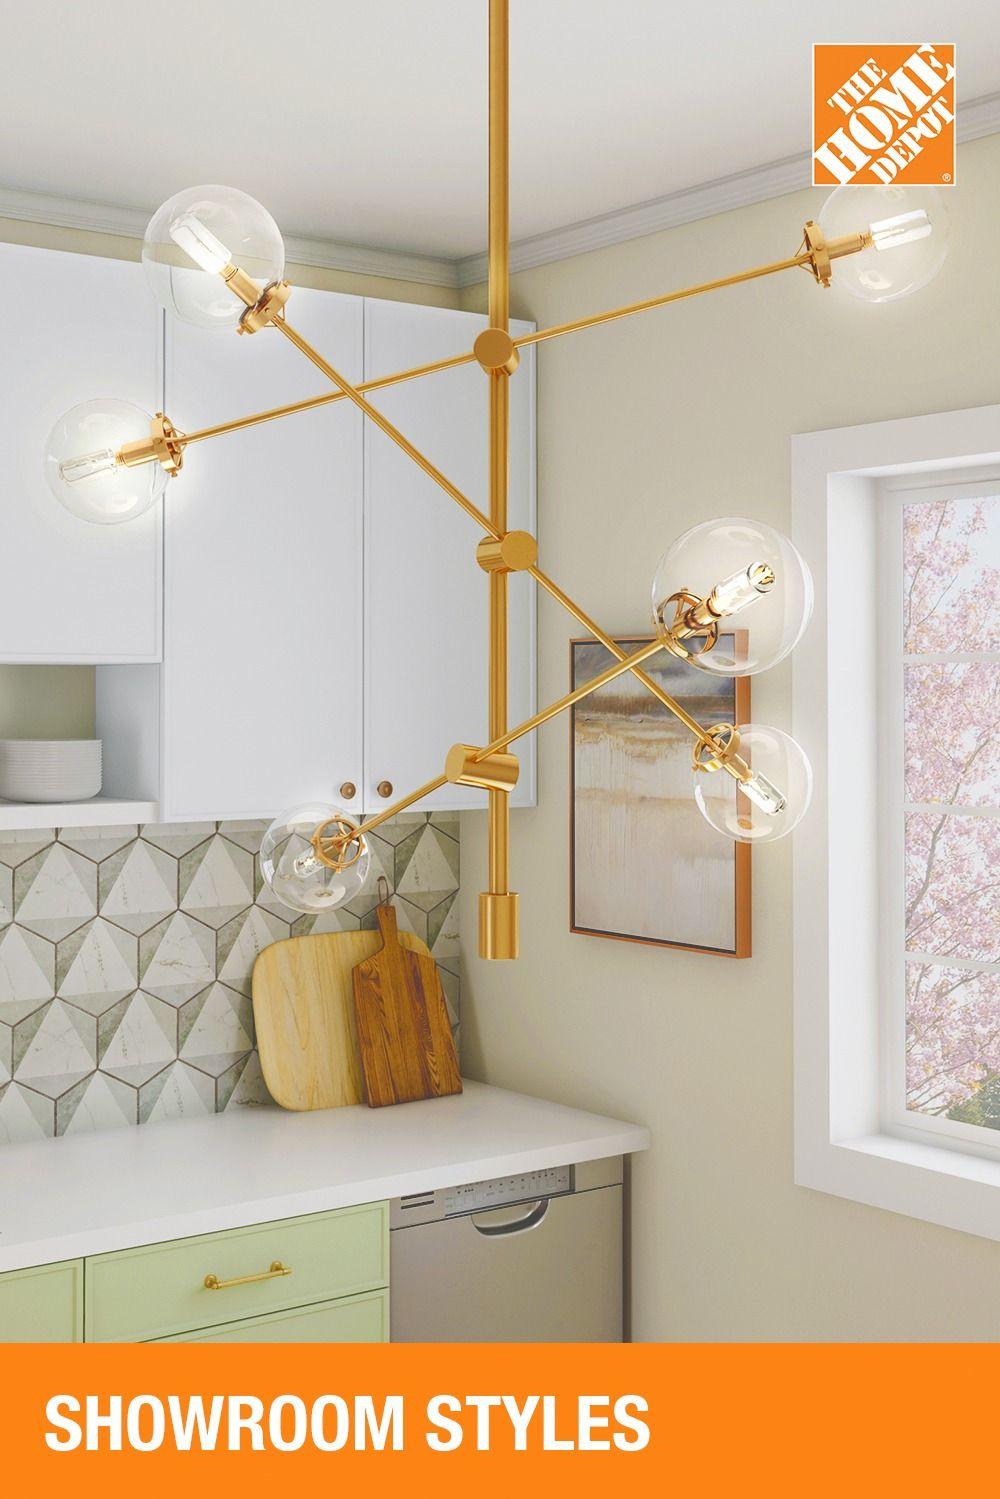 Trending Lights Live Here Home Design Decor Home Decor Bedroom Best Interior Design